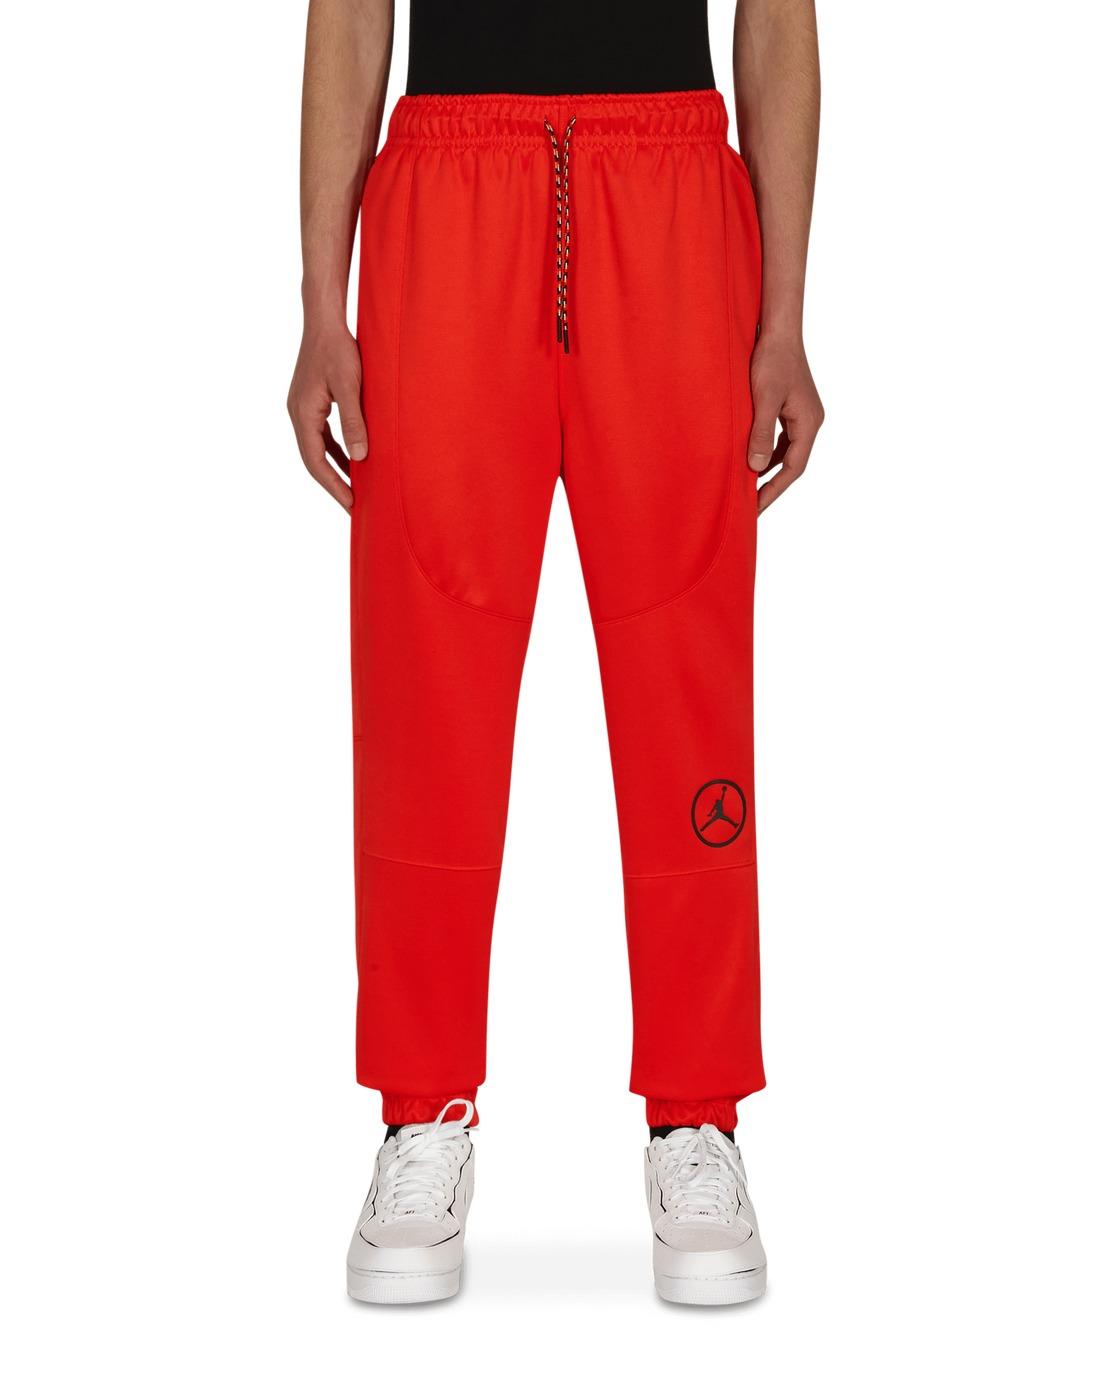 Nike Jordan Sport Dna Track Pants Chile Red/Black